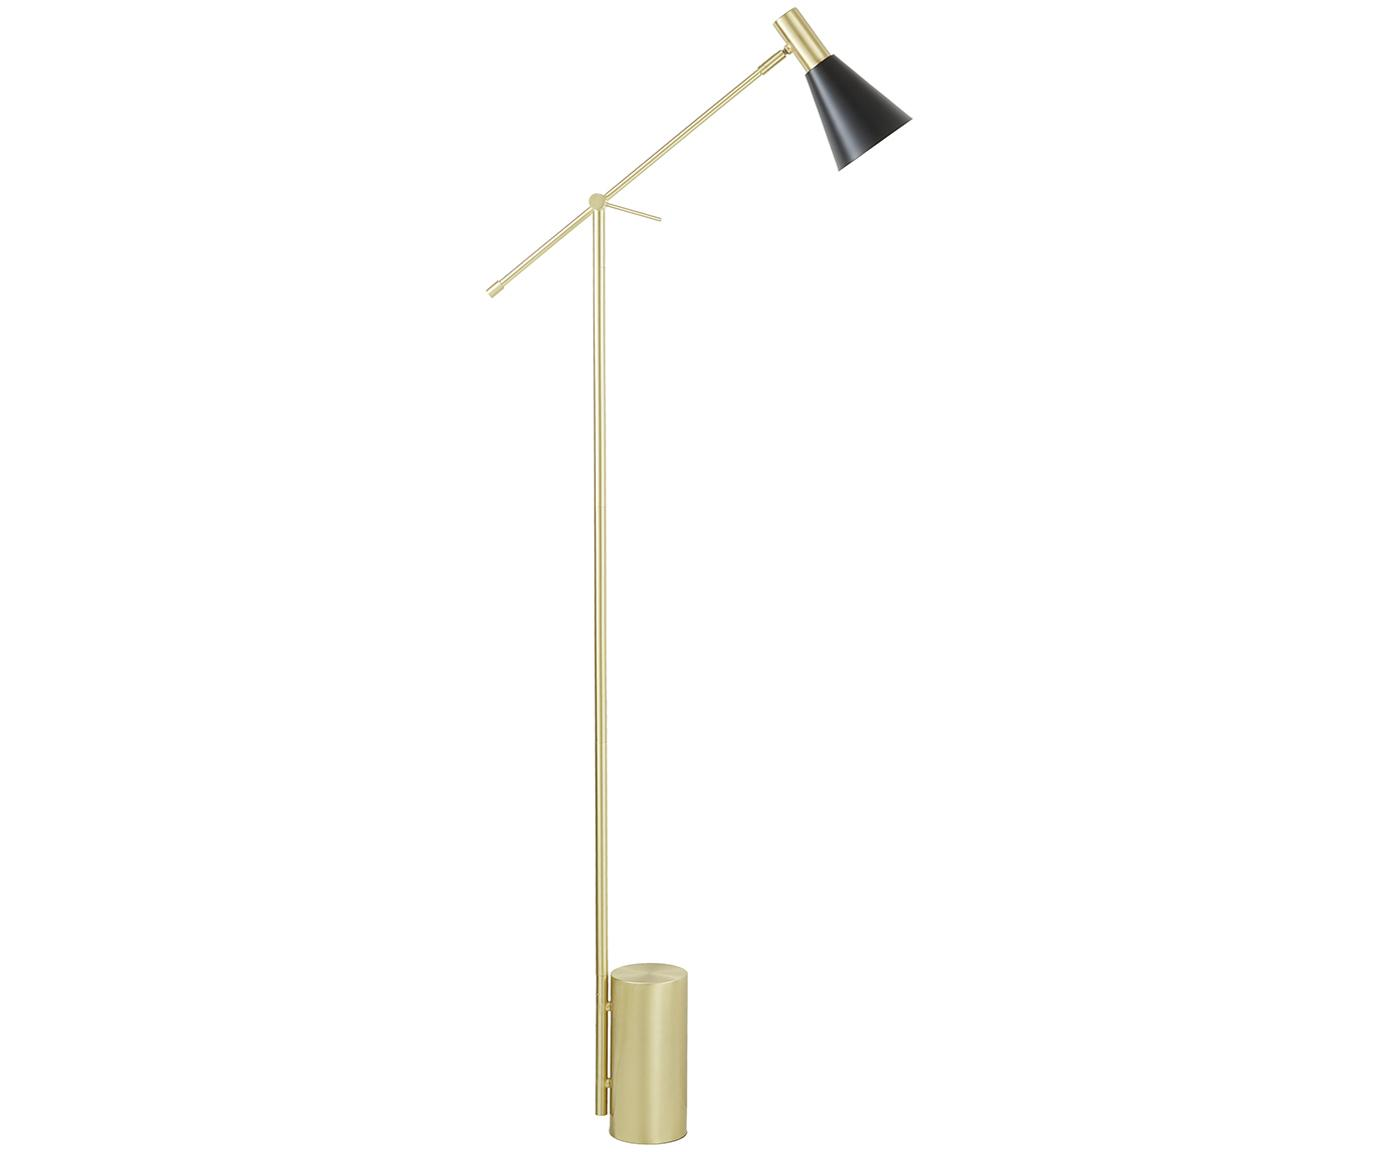 Stehlampe Sia, Lampenschirm: Metall, pulverbeschichtet, Lampenfuß: Metall, vermessingt, Schwarz, Ø 14 x H 162 cm